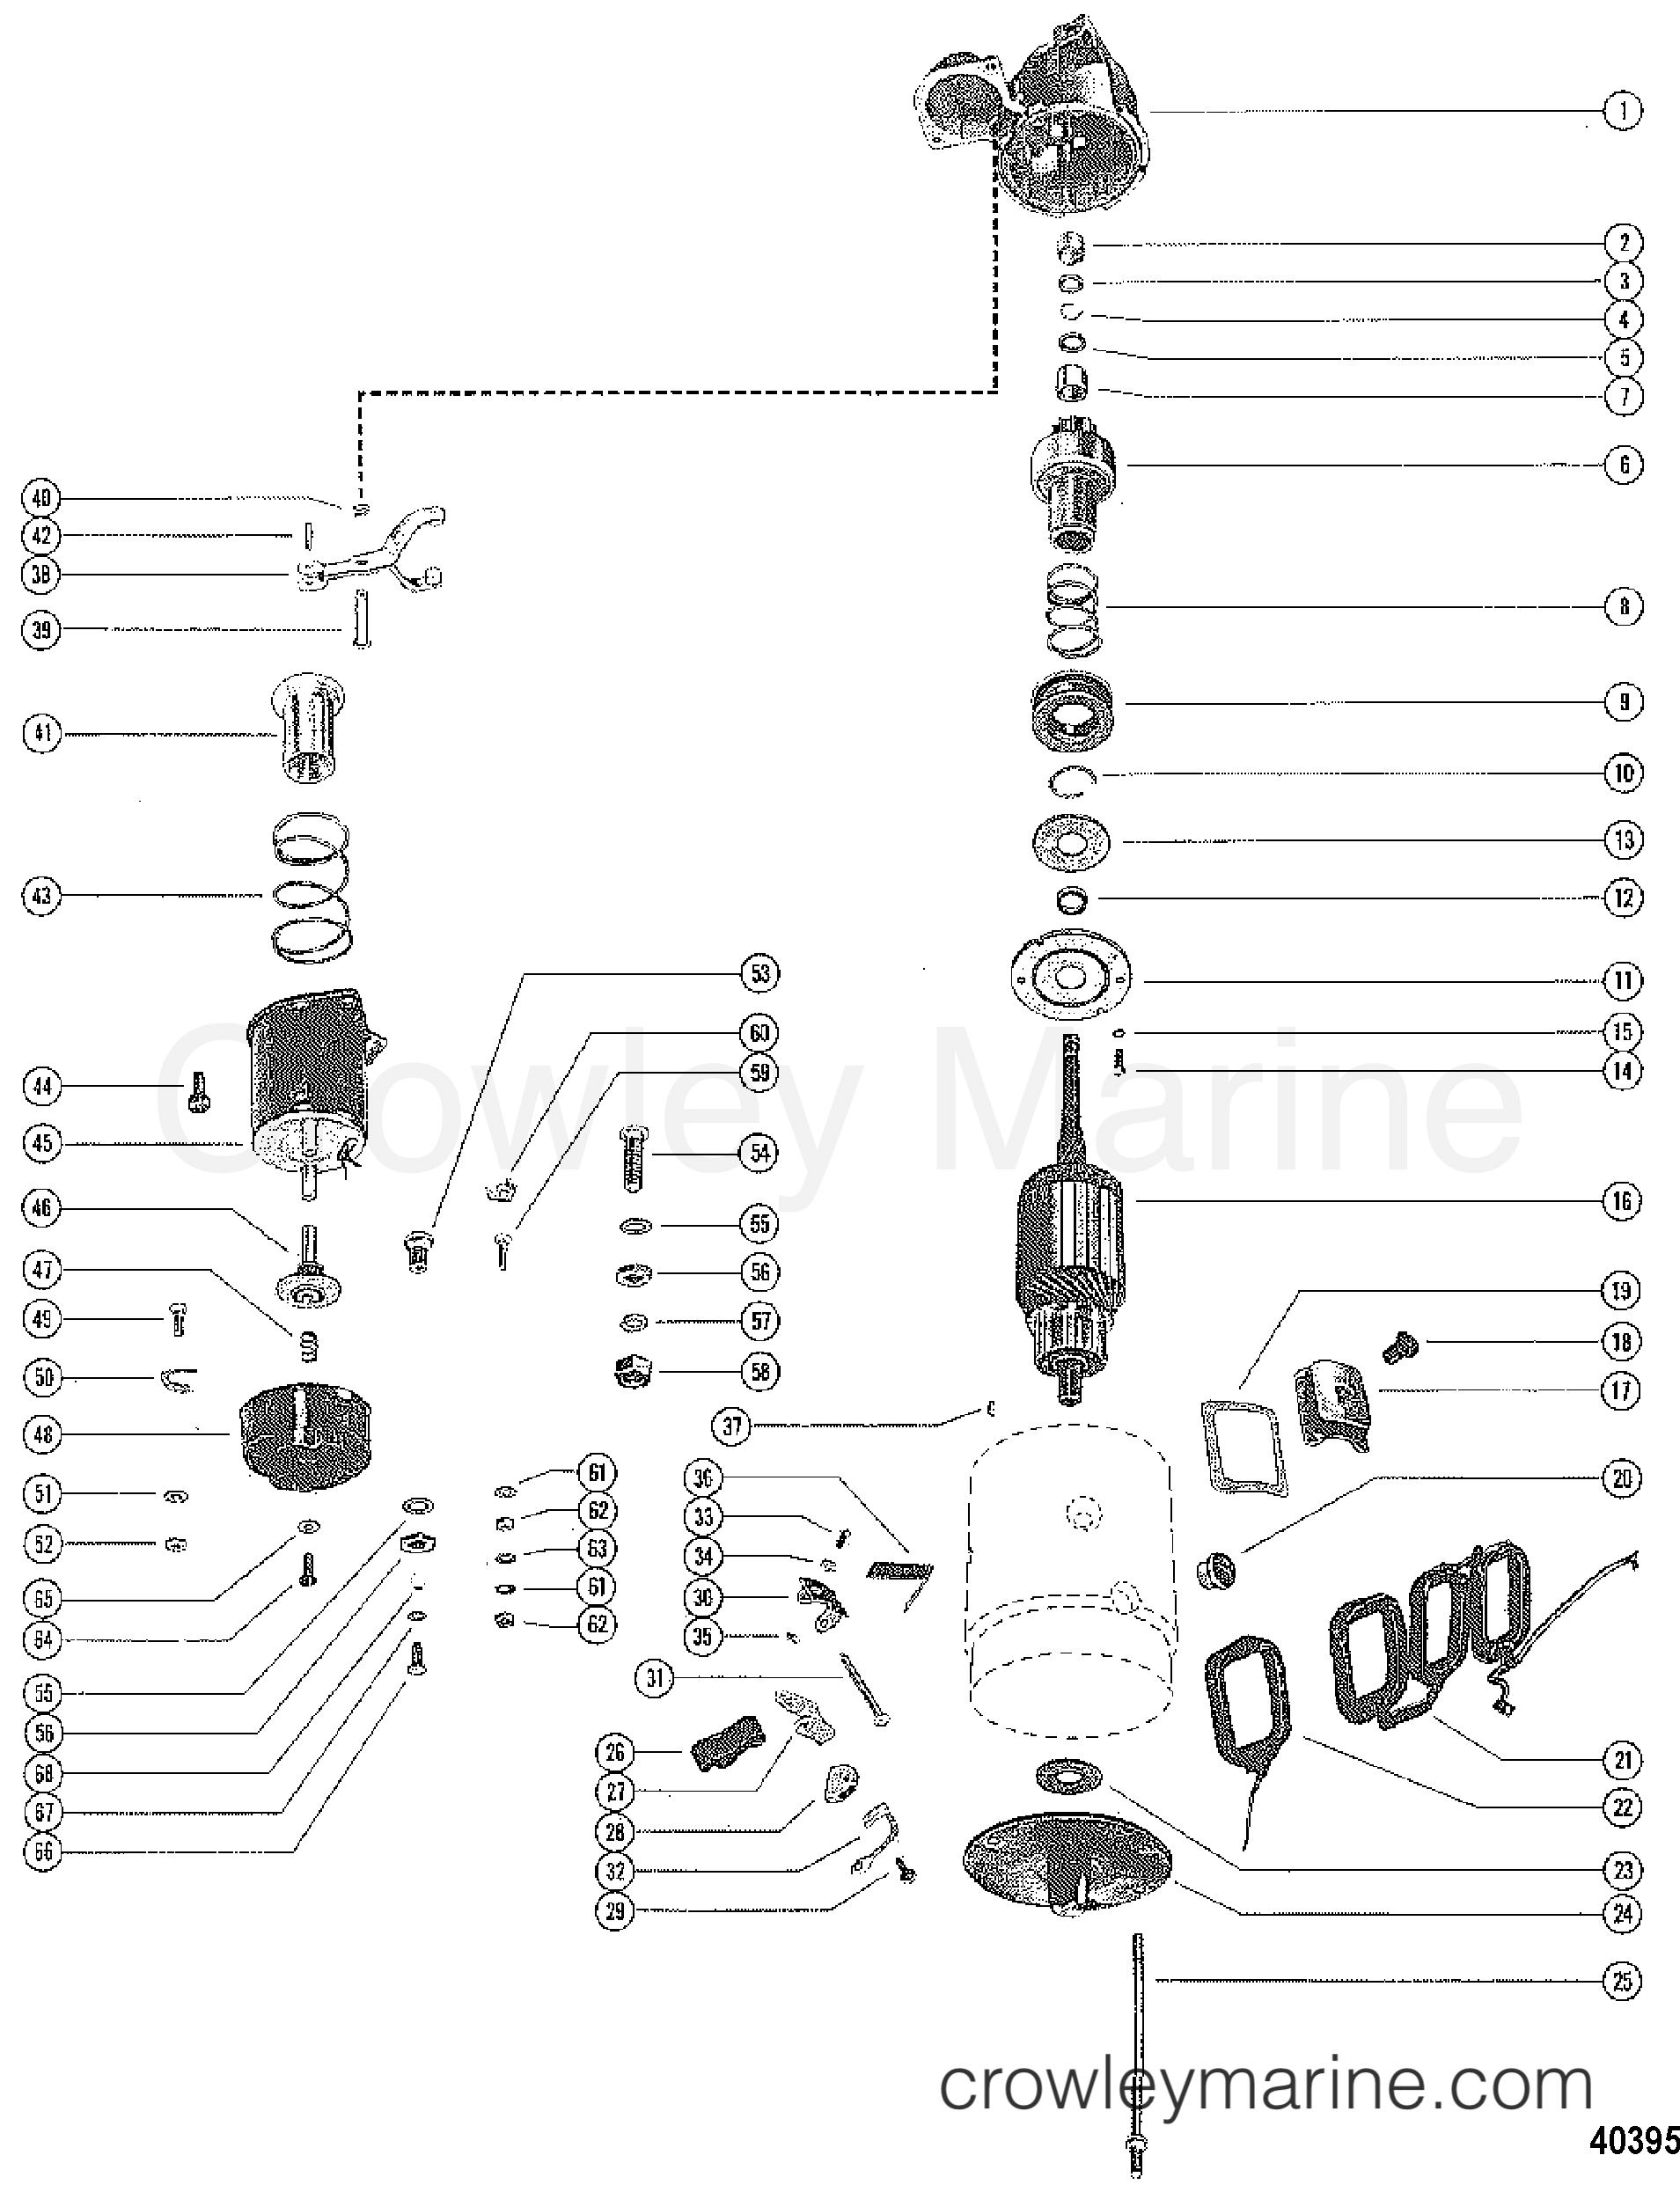 yamaha outboard motor wiring diagrams  u2013 the wiring diagram